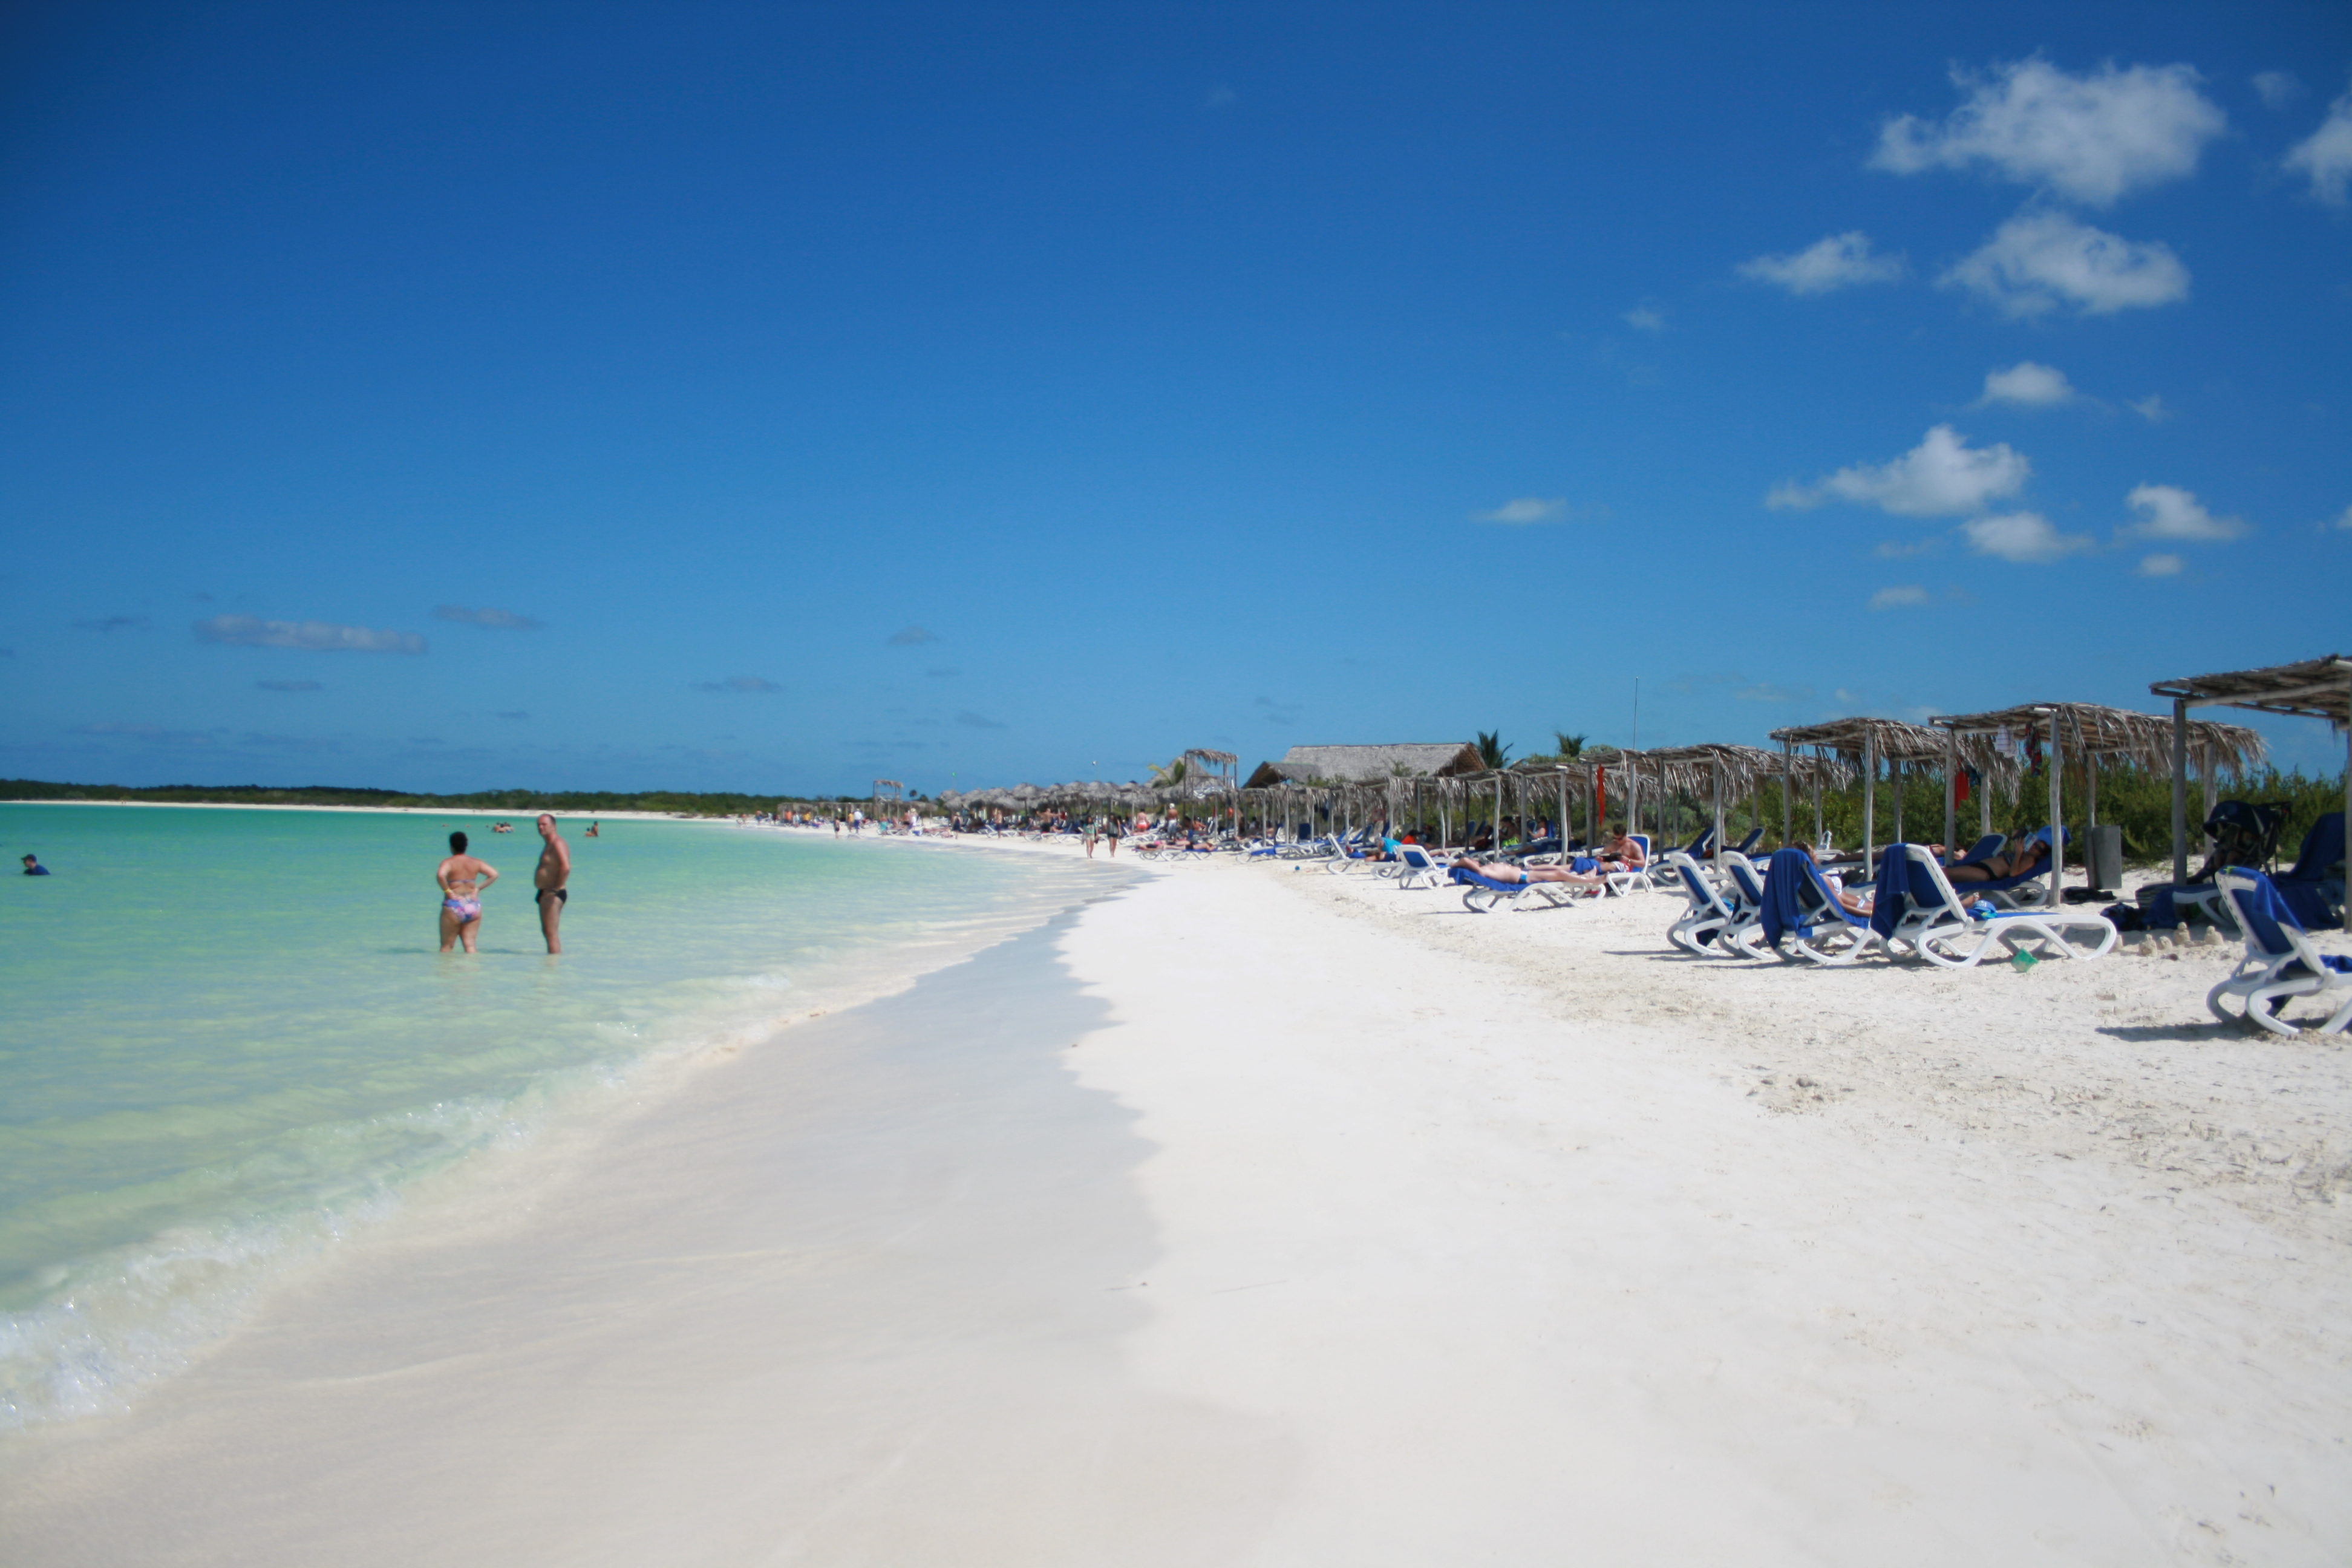 Sign designating Nude Beach - Picture of Sol Cayo Santa